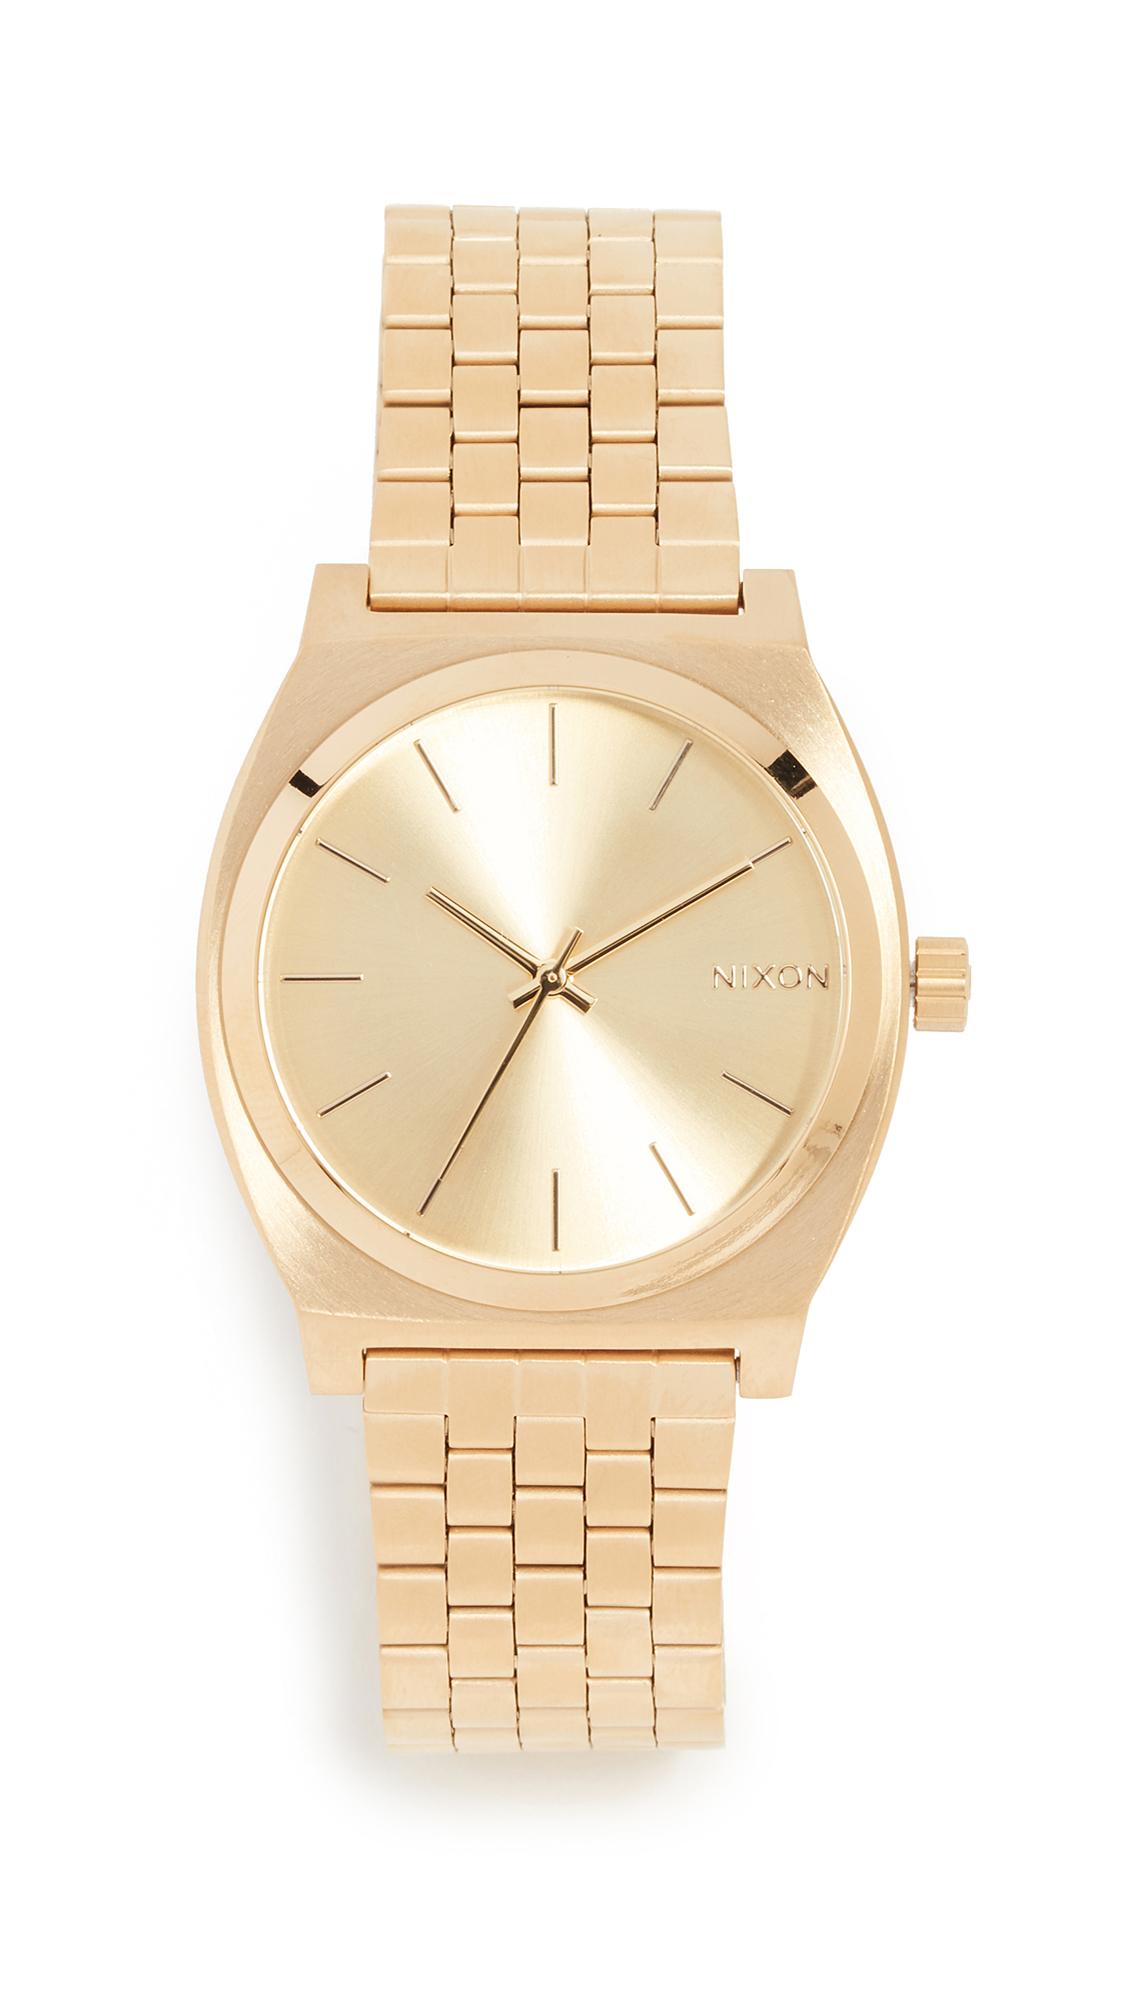 Nixon Time Teller Watch - Gold